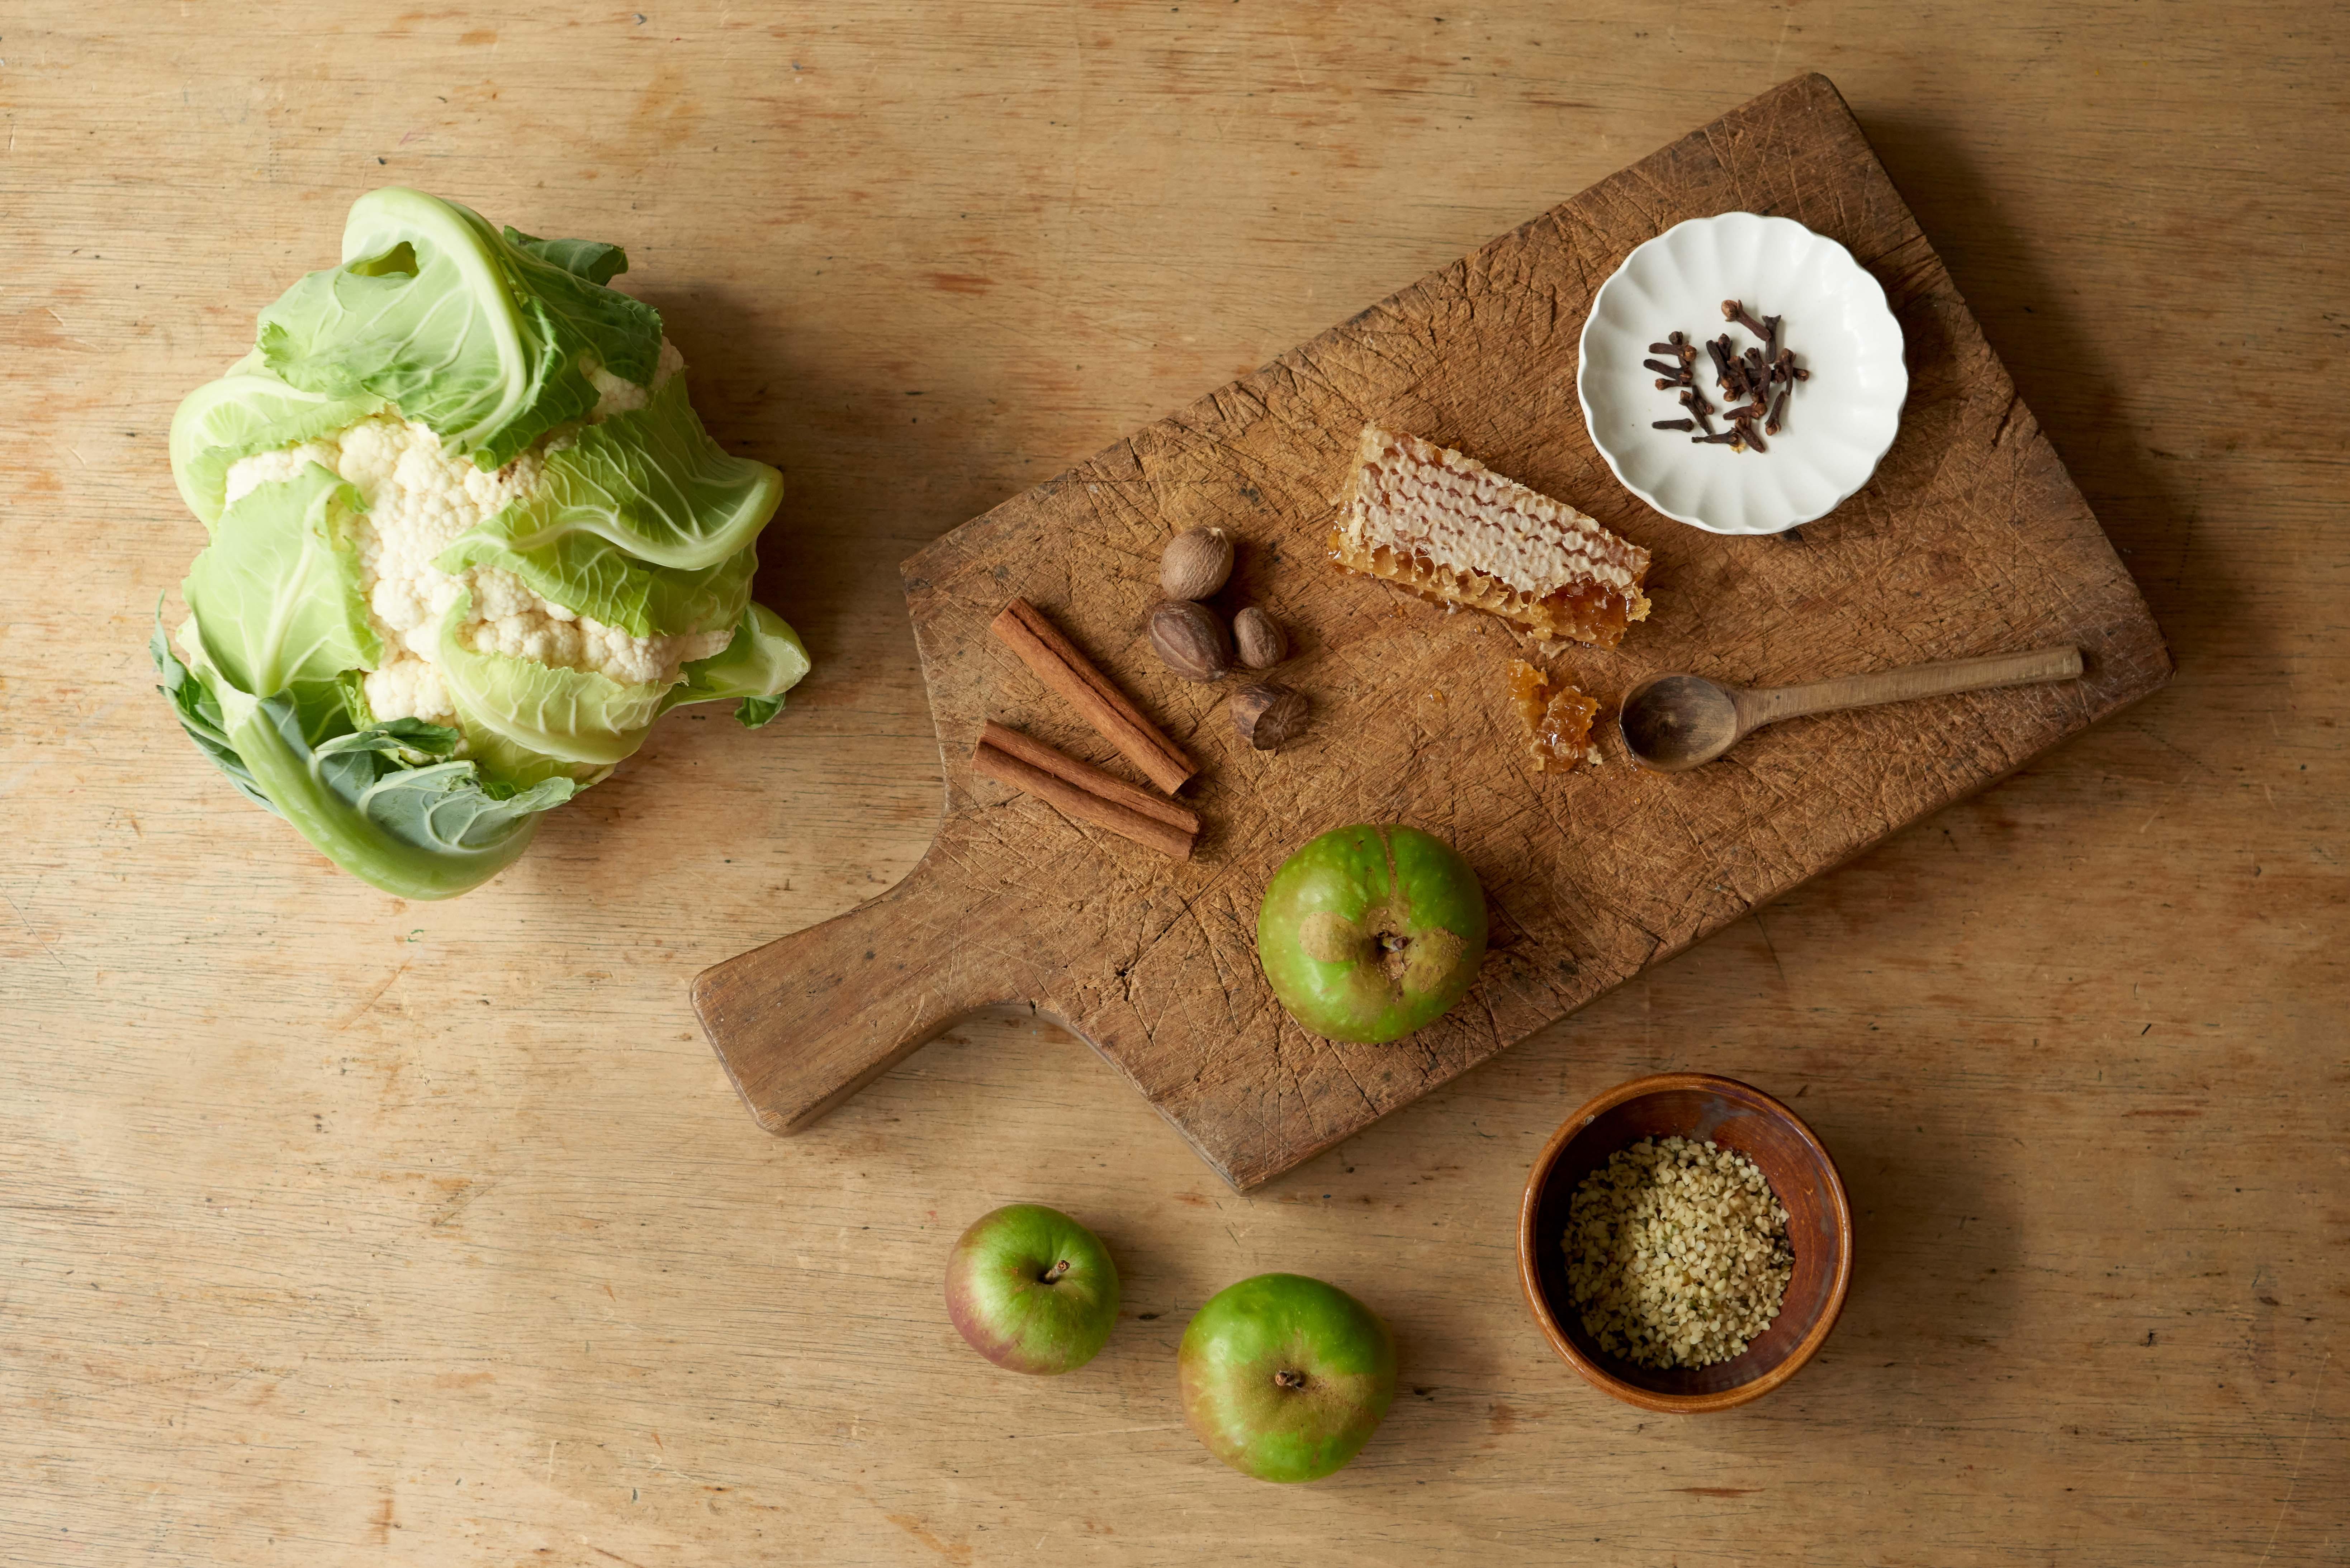 recipe: Apple Pie Smoothie